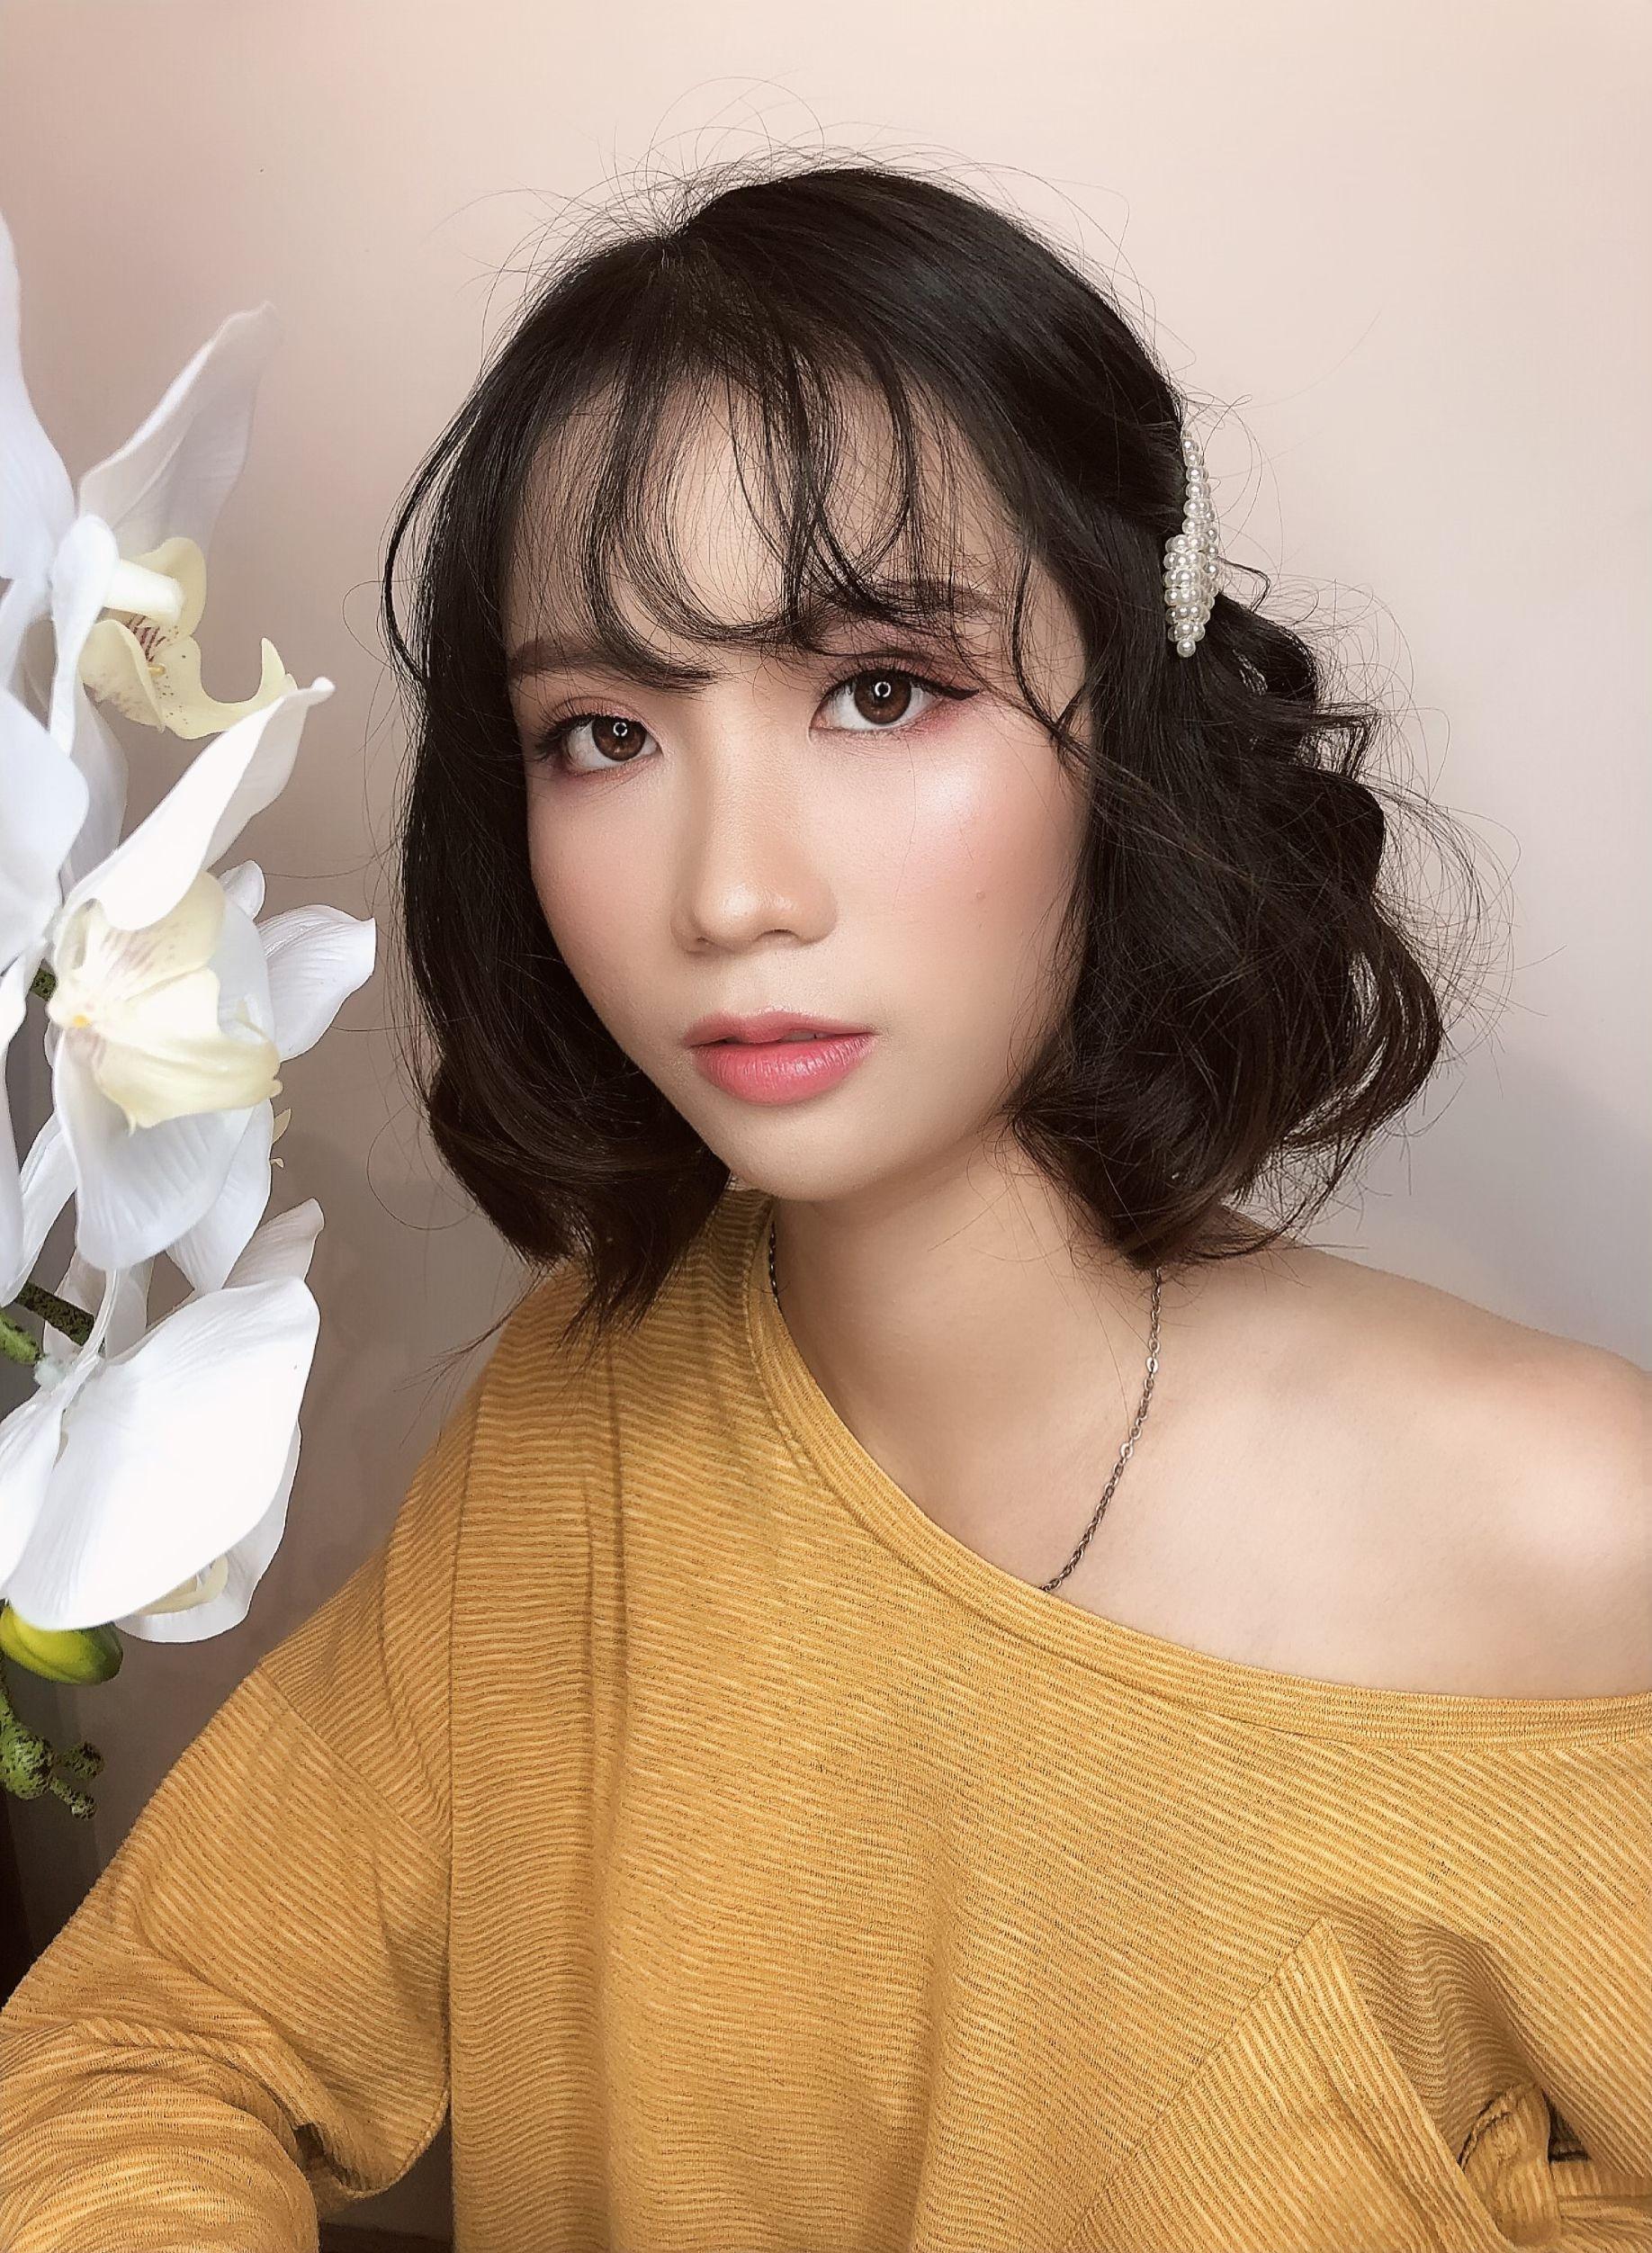 Makeup by Nhung Nguyen Korea pink n cute baby style